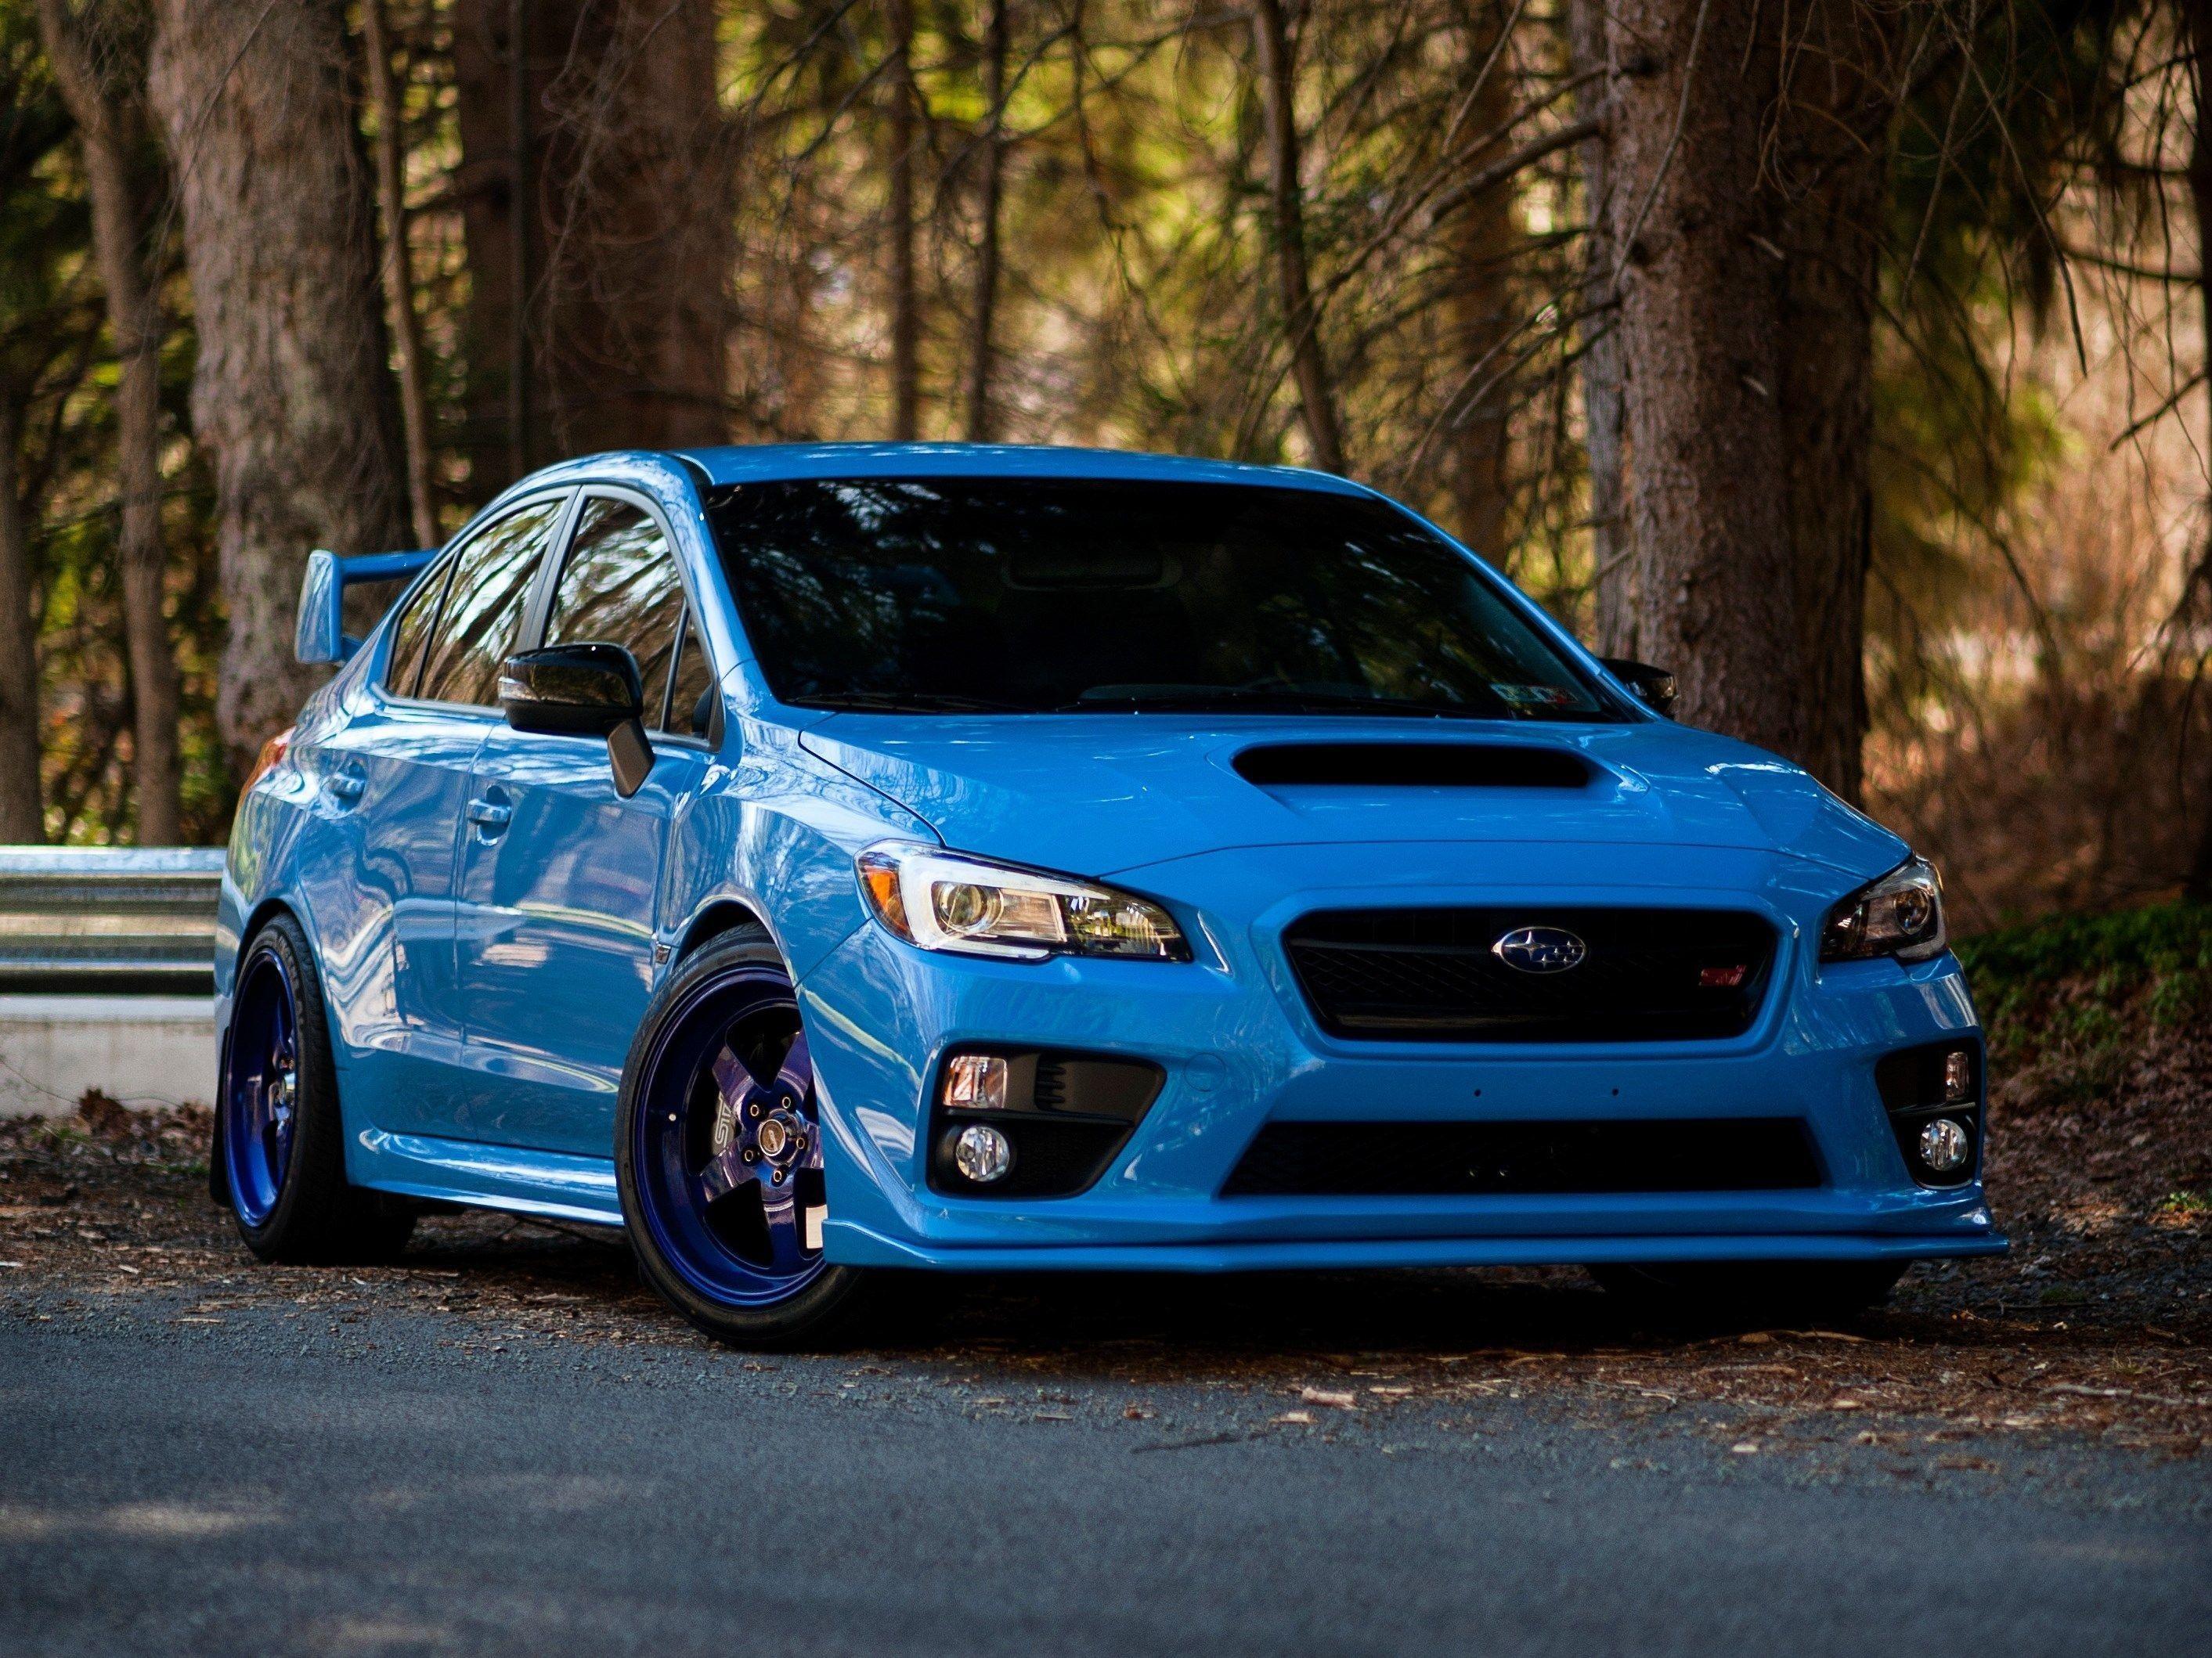 Subaru WRX Wallpapers - Top Free Subaru